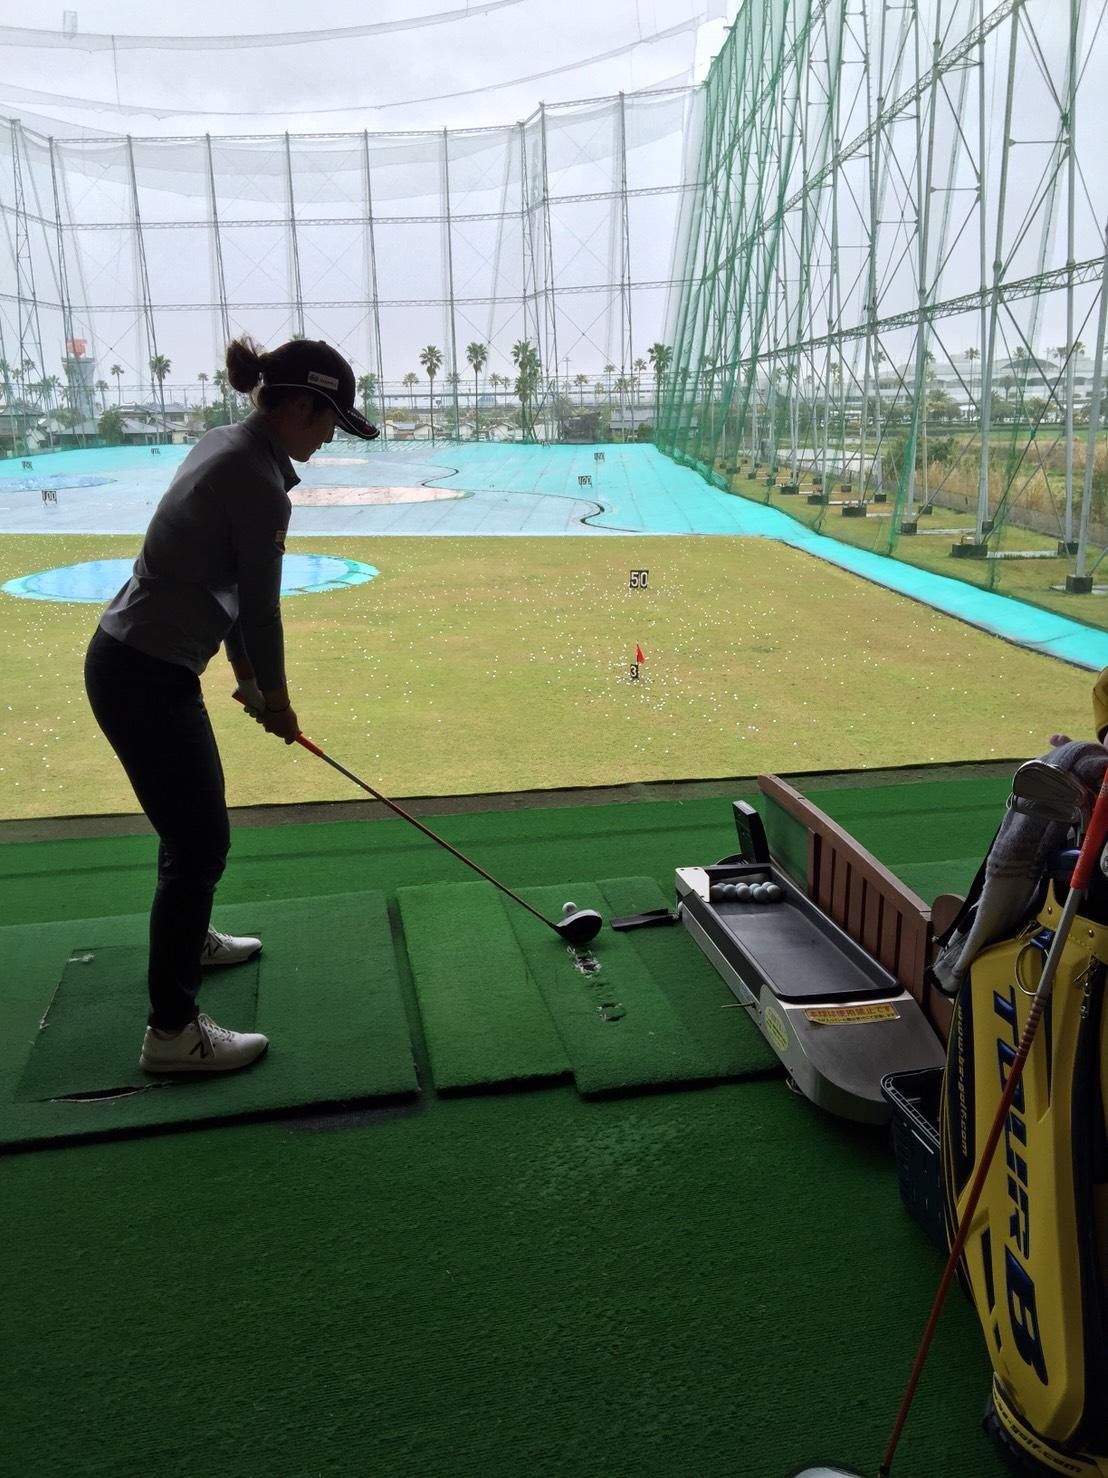 http://www.bs-golf.com/pro/85ee8f0e57a440b905bc861fd00331c10f2c2c03.JPG